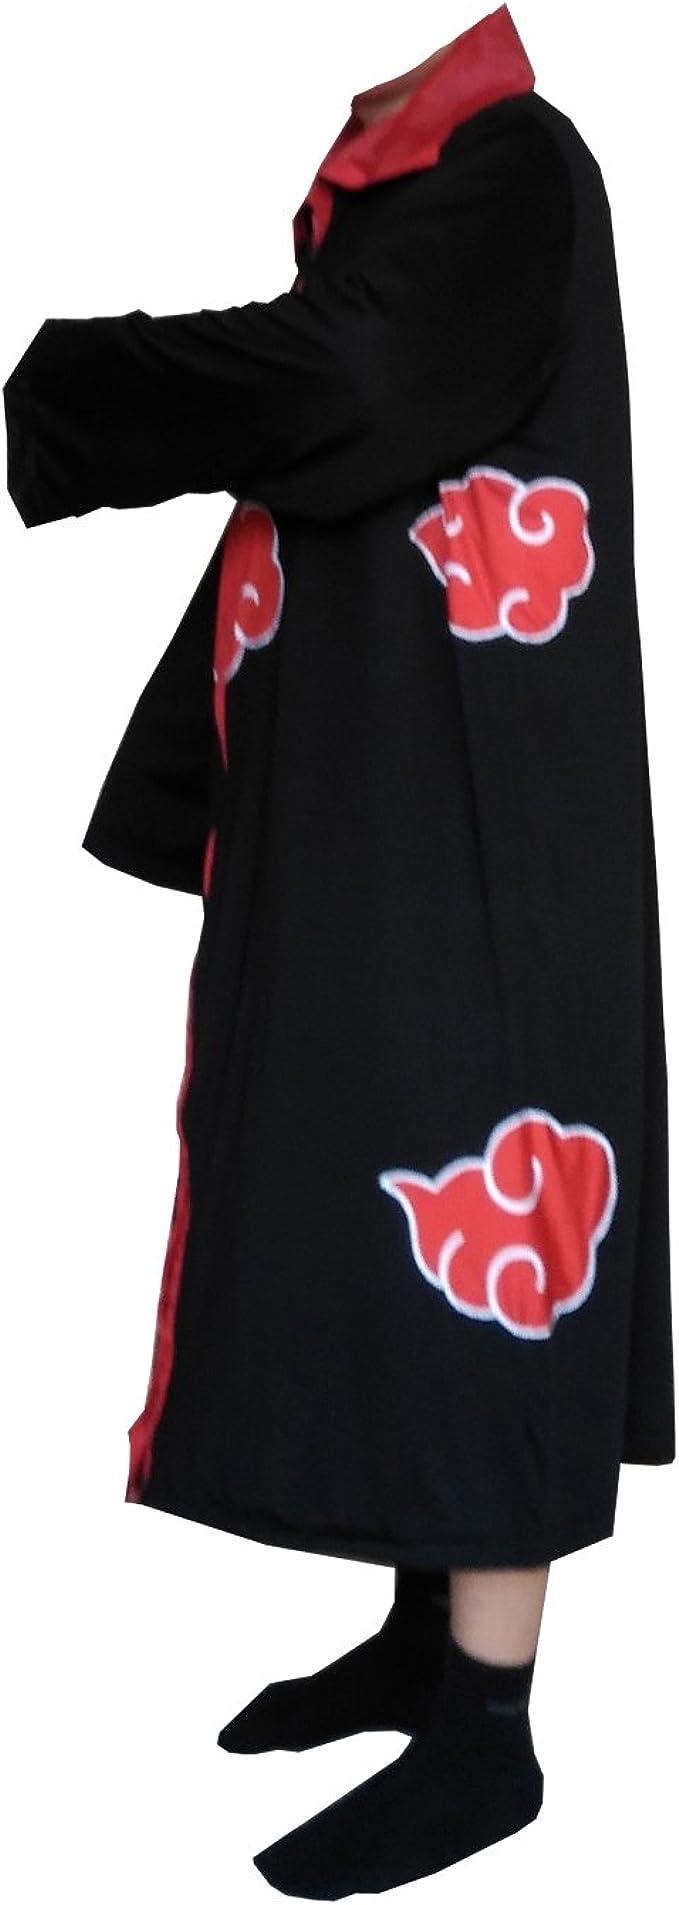 Amazon.com: Naruto manto adulto disfraz Anime tamaños de ...